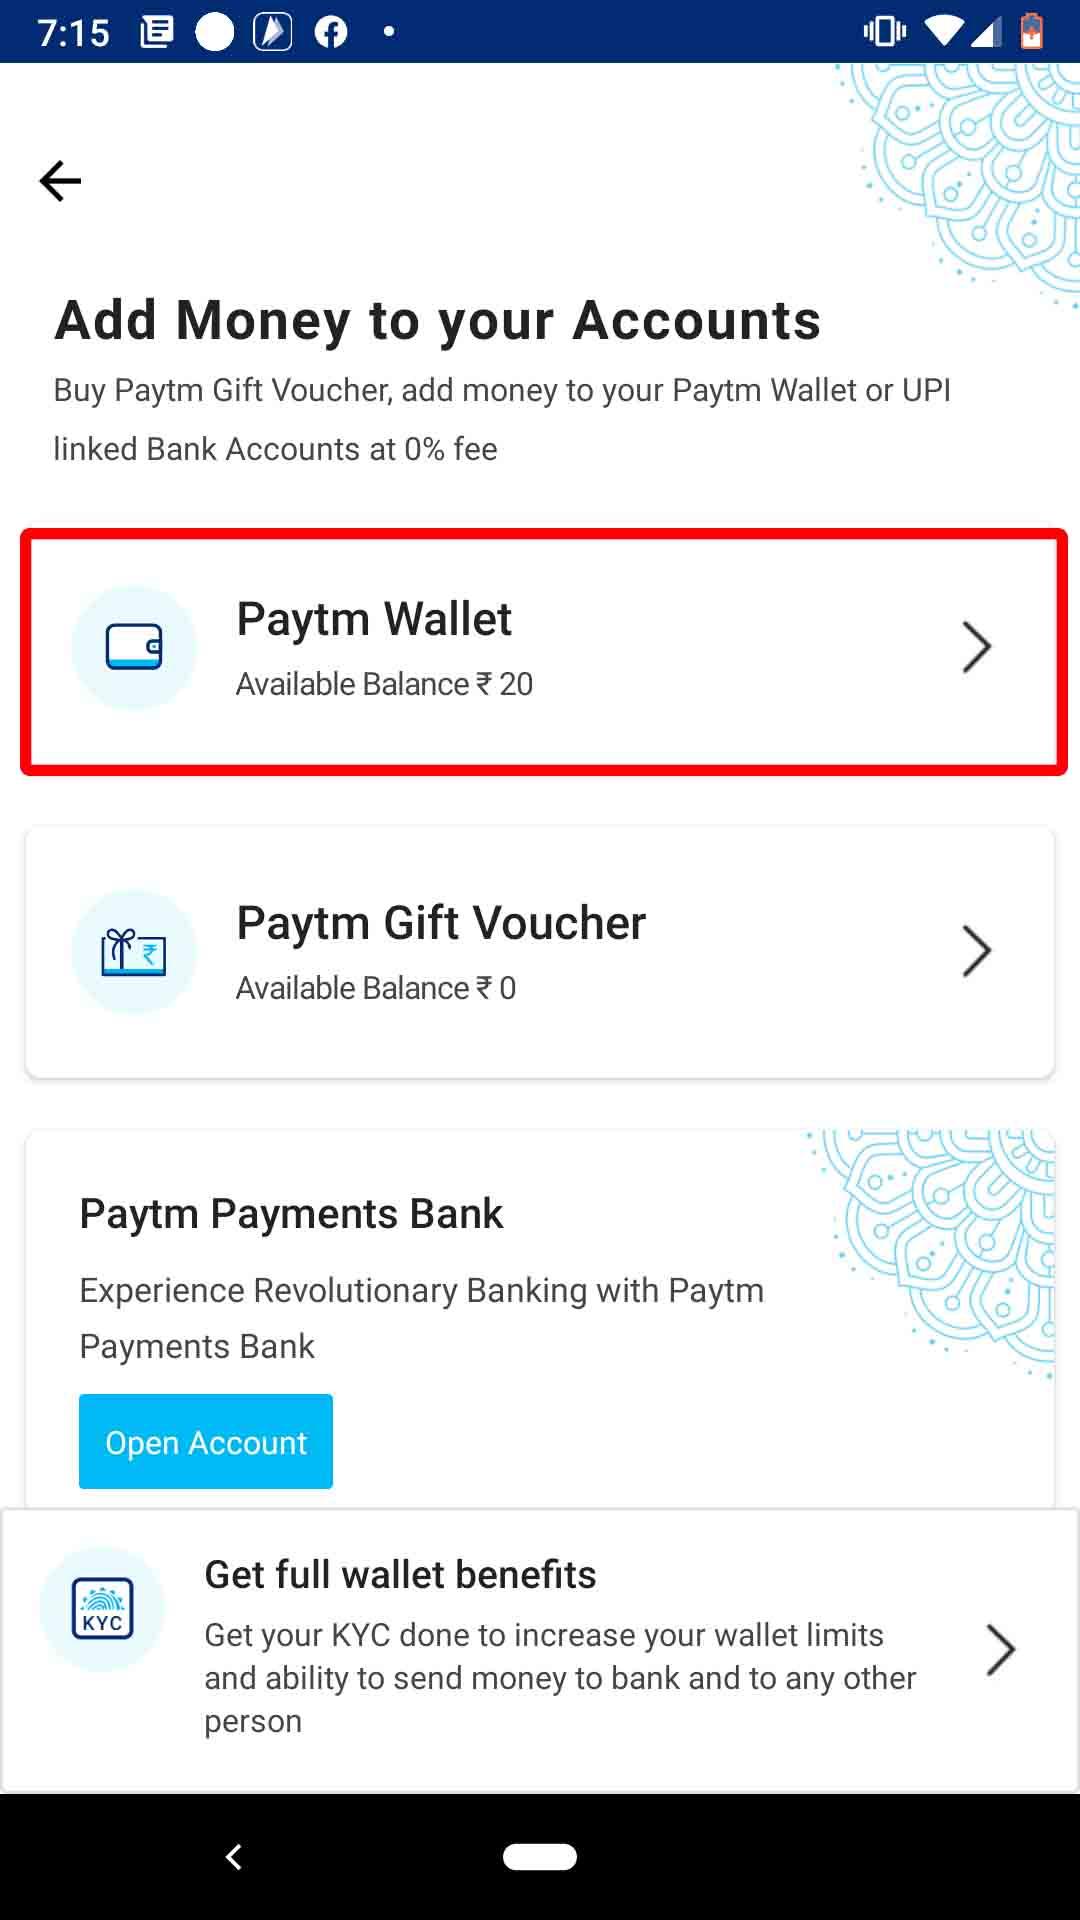 Tap Paytm Wallet